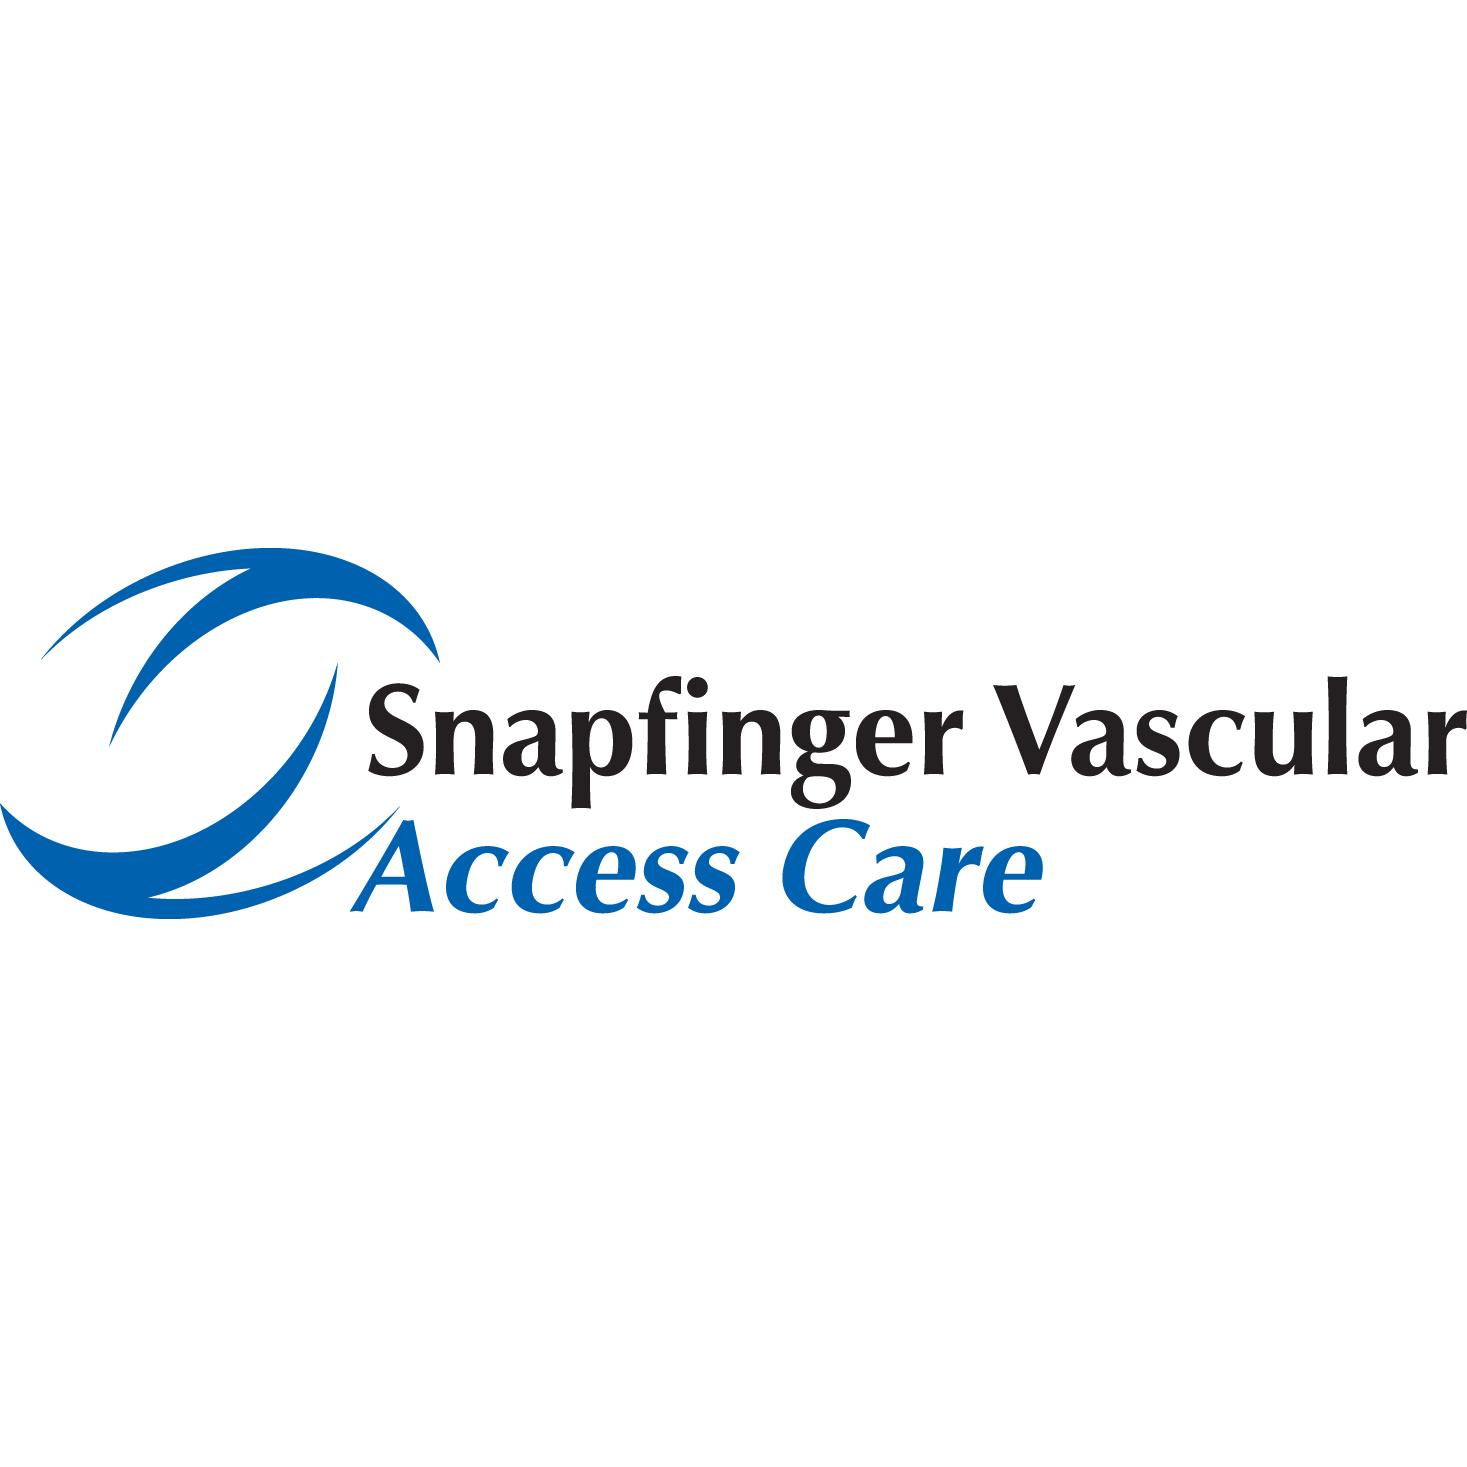 Snapfinger Vascular Access